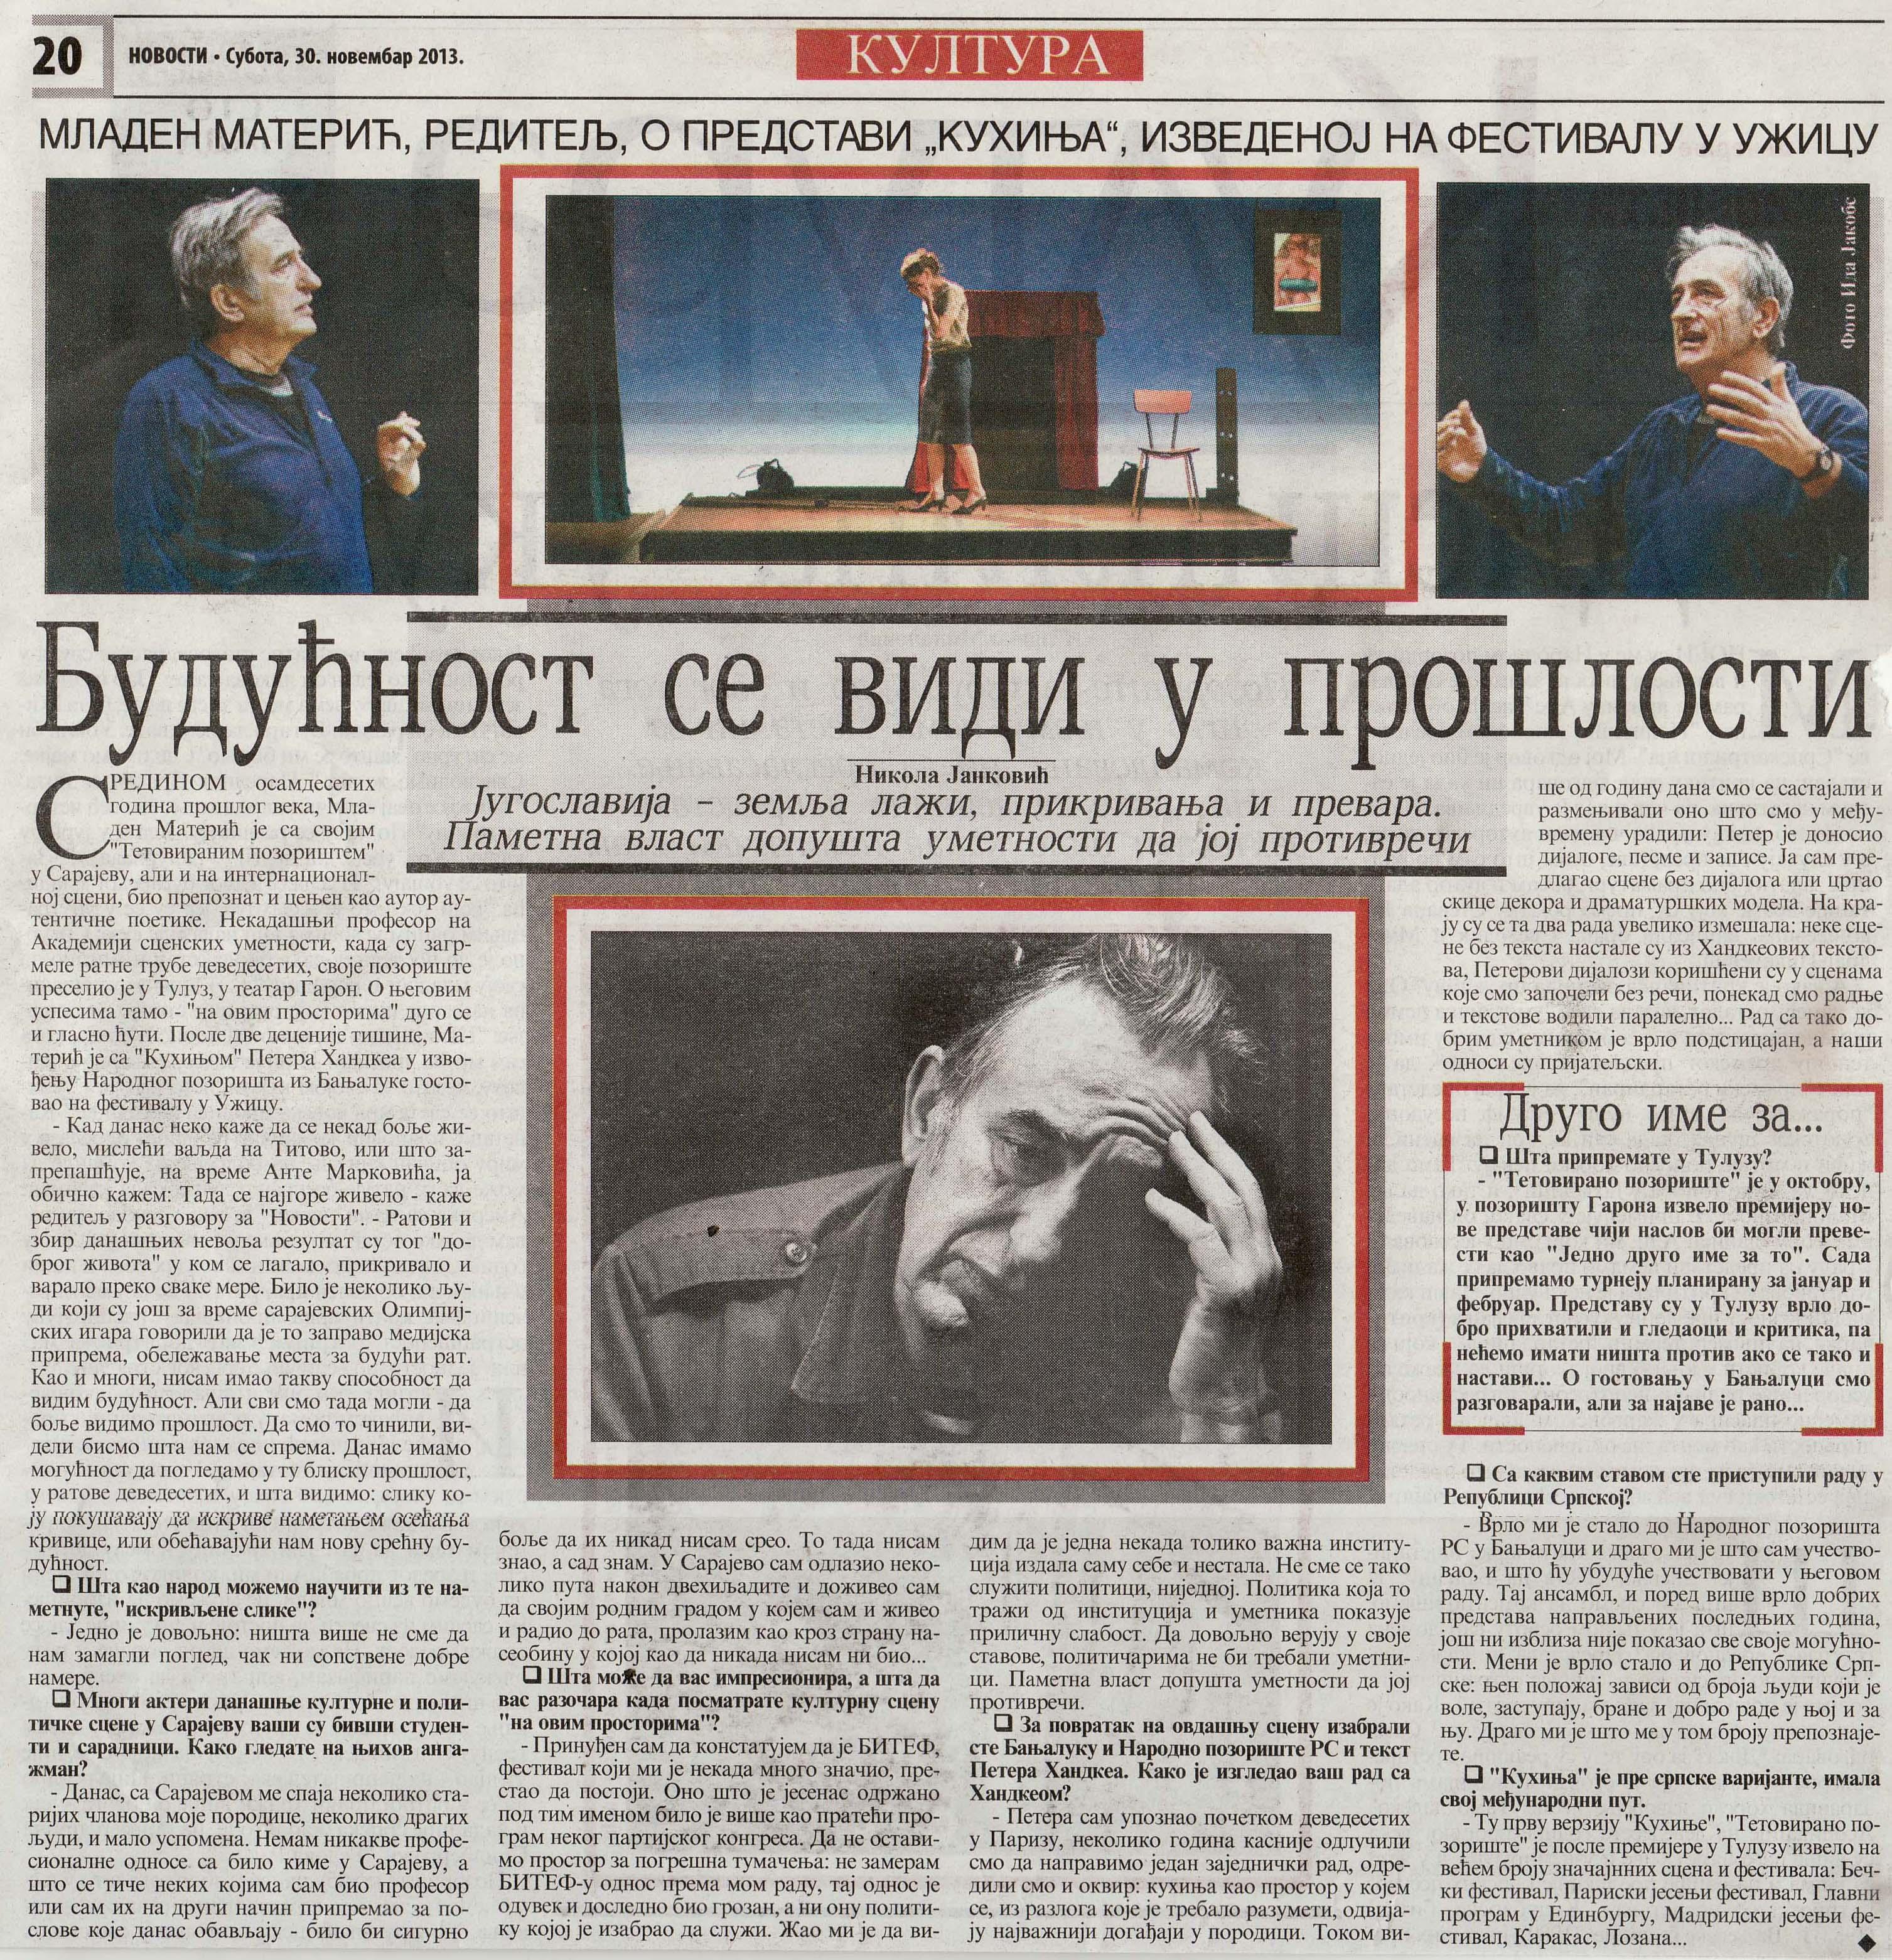 vecernje-novosti-begrade-serbie-30112013